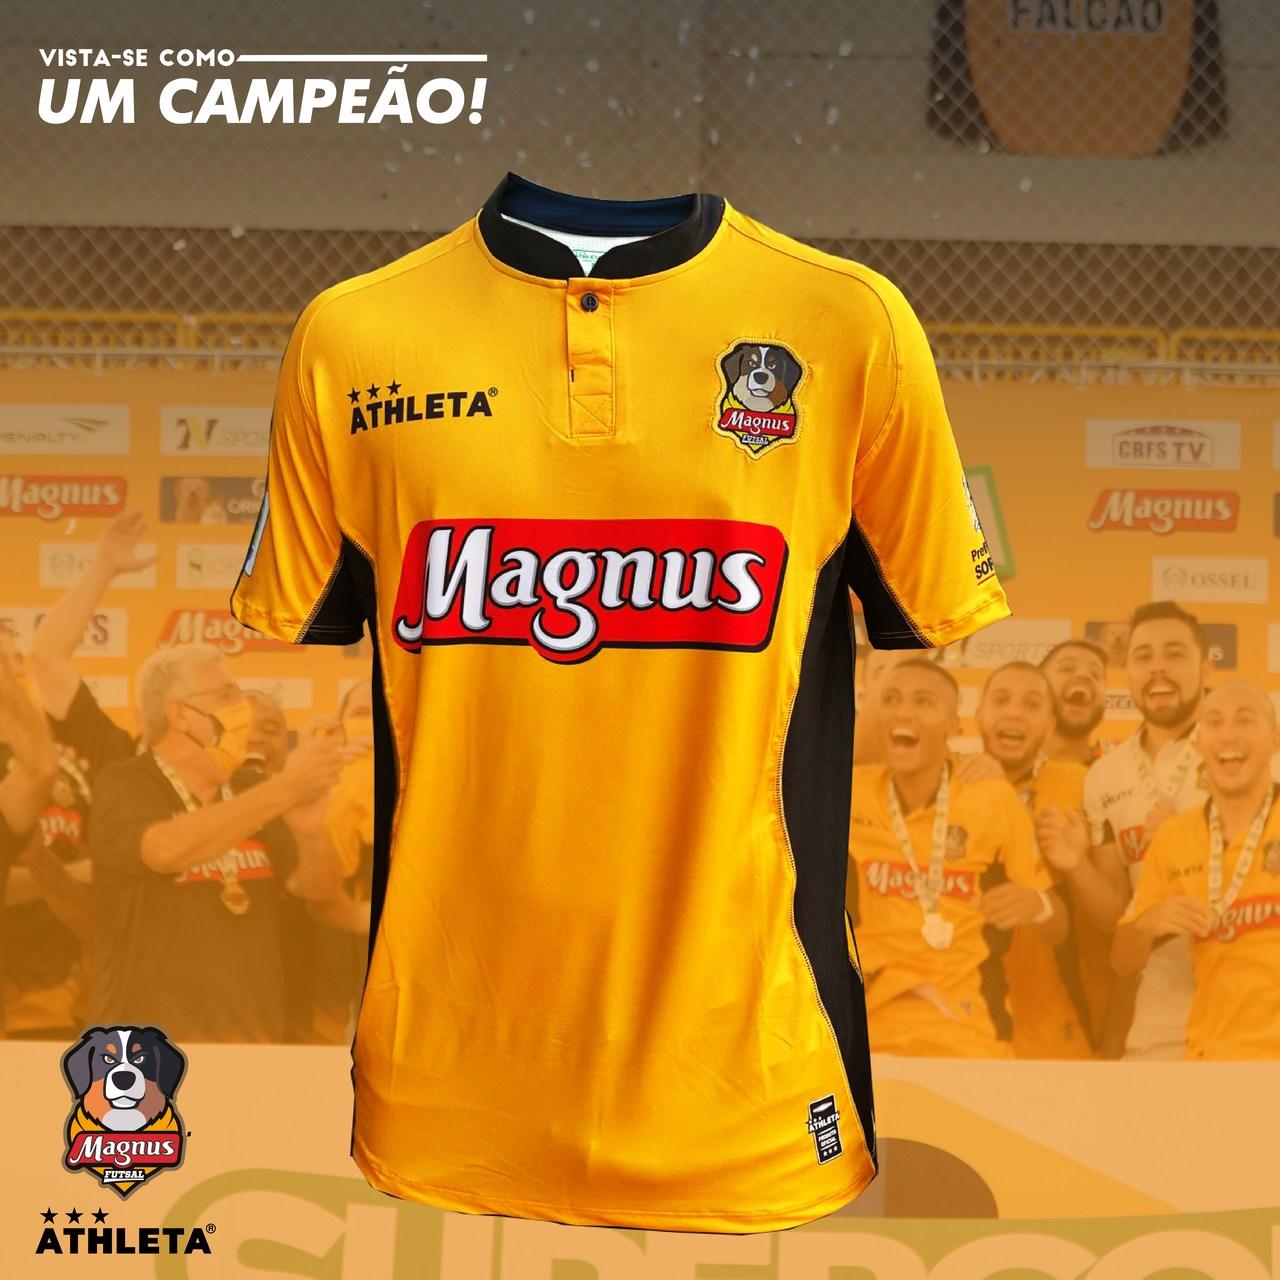 Camisa Magnus Oficial 2021 - Amarela - PRÉ VENDA